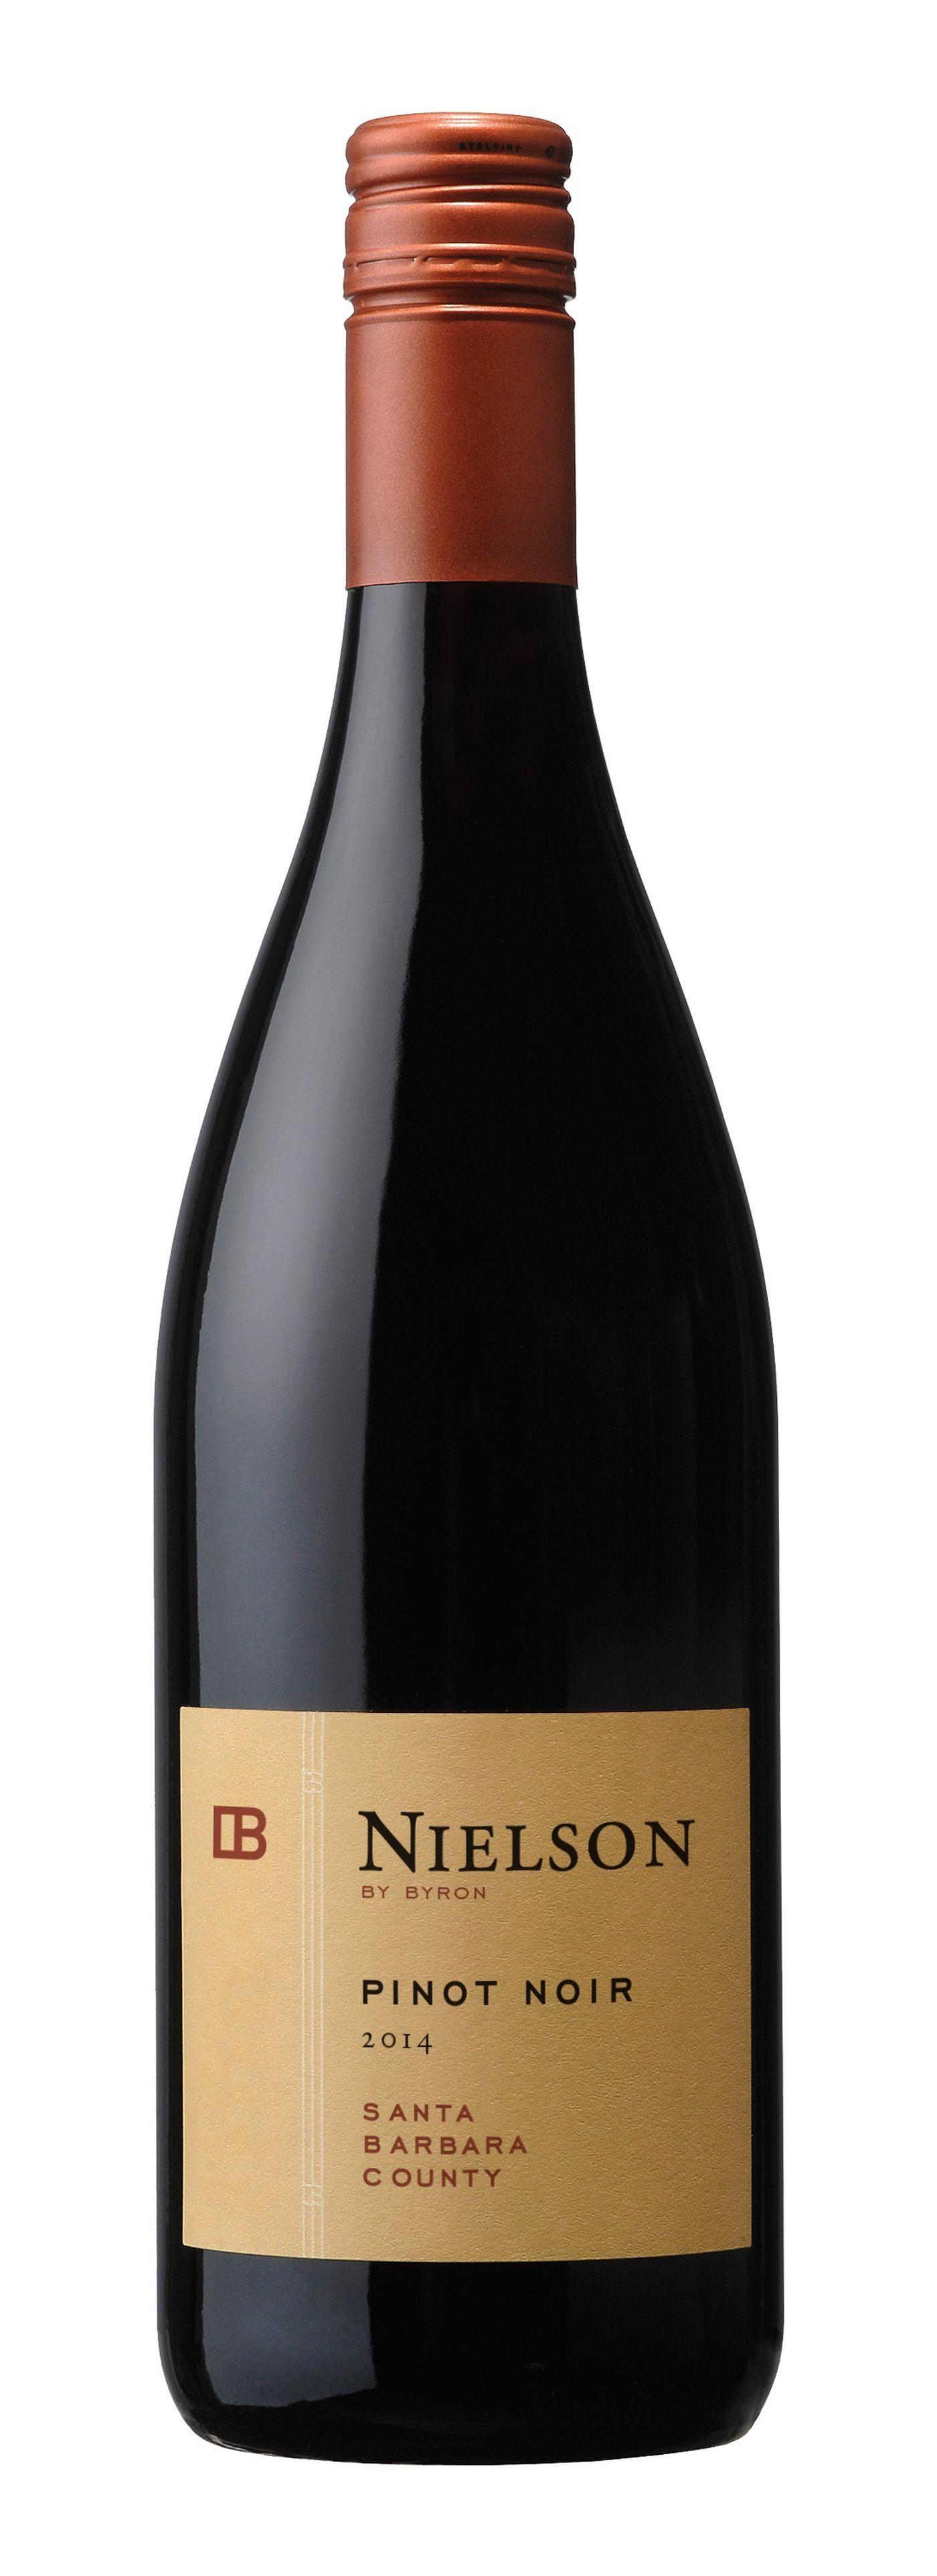 Great Wine Values: Nielson Pinot Noir, Santa Barbara County, Calif.